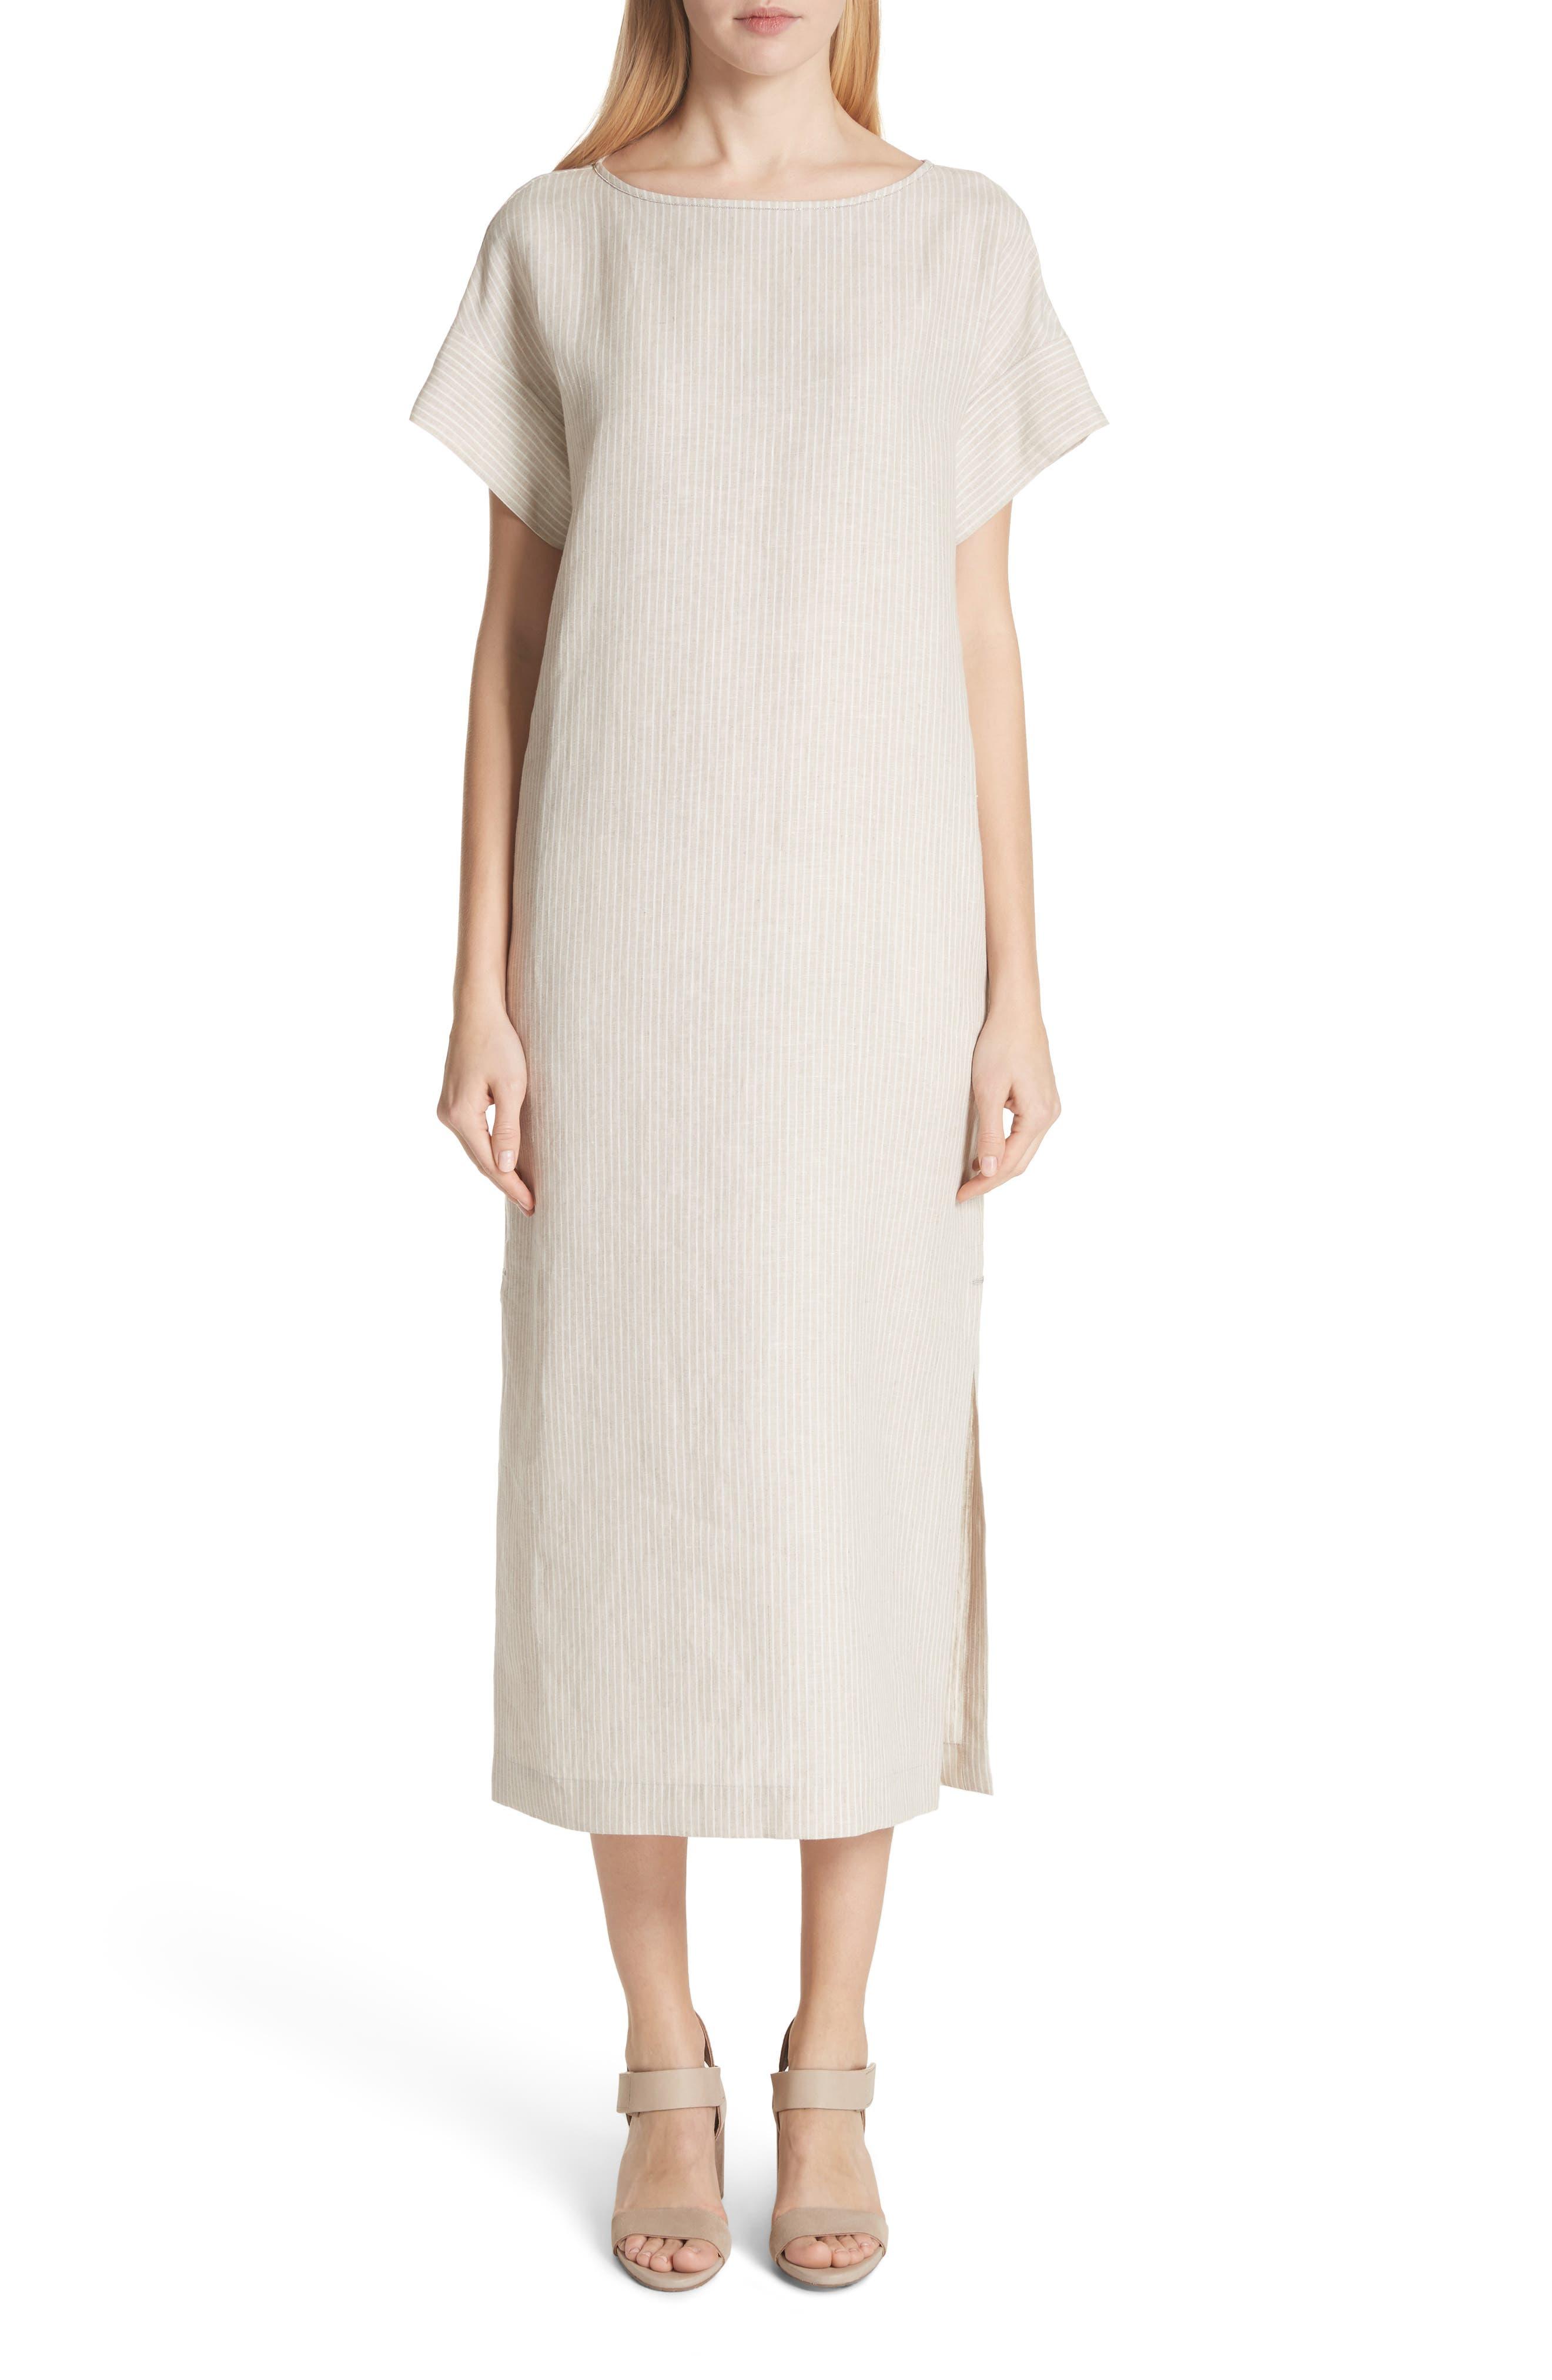 LAFAYETTE 148 NEW YORK,                             Emiline Stripe Linen Dress,                             Main thumbnail 1, color,                             251